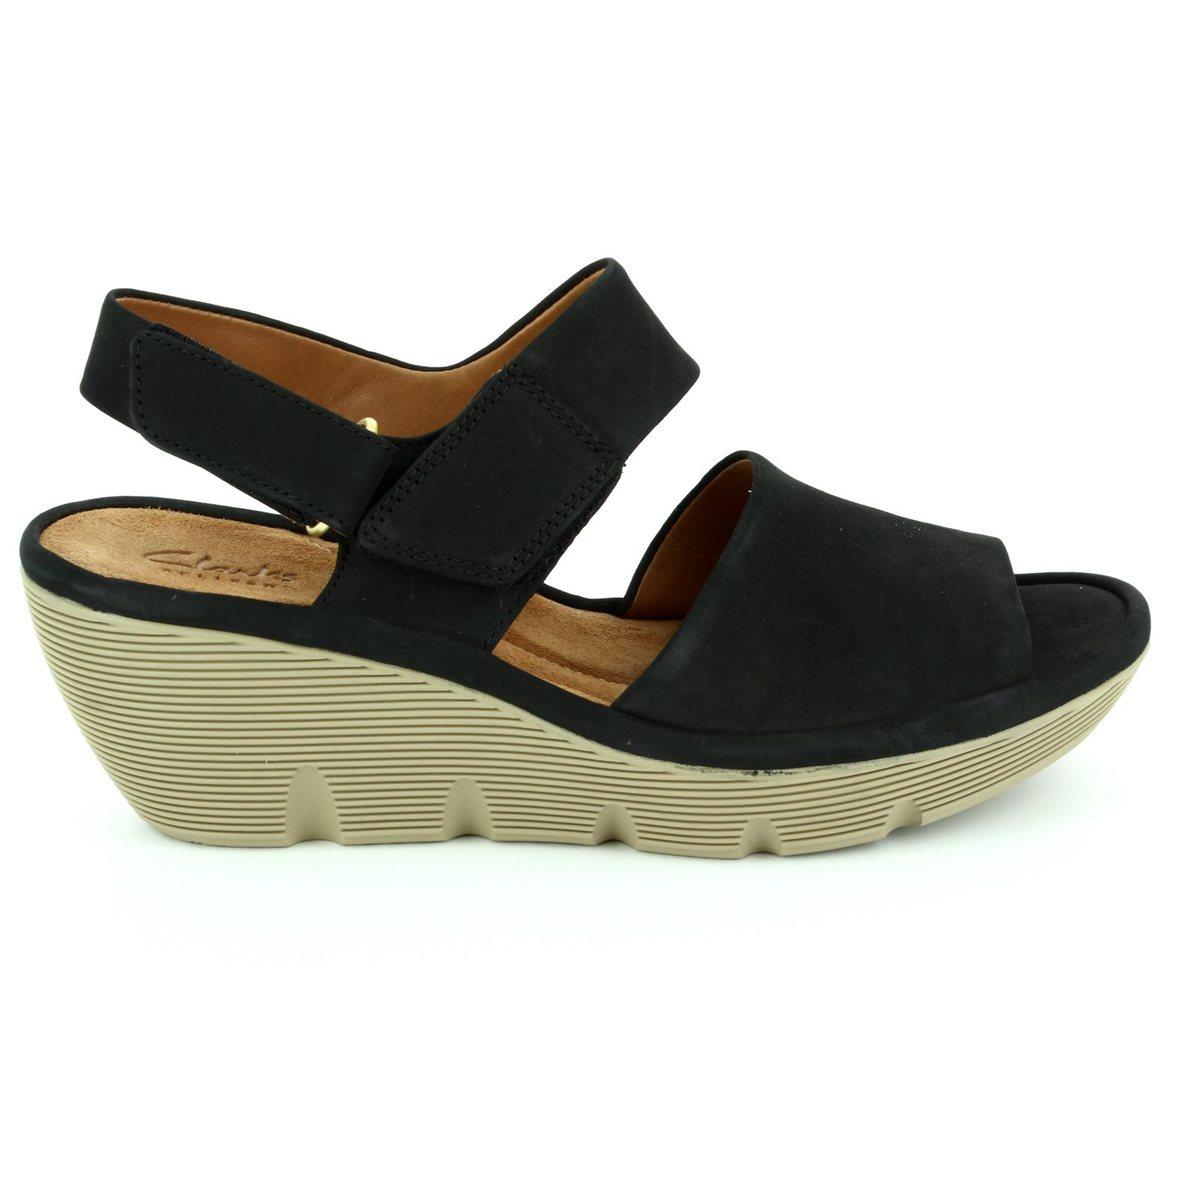 a34d3999dde Clarks Sandals - Black nubuck - 2428 04D CLARENE ALLURE